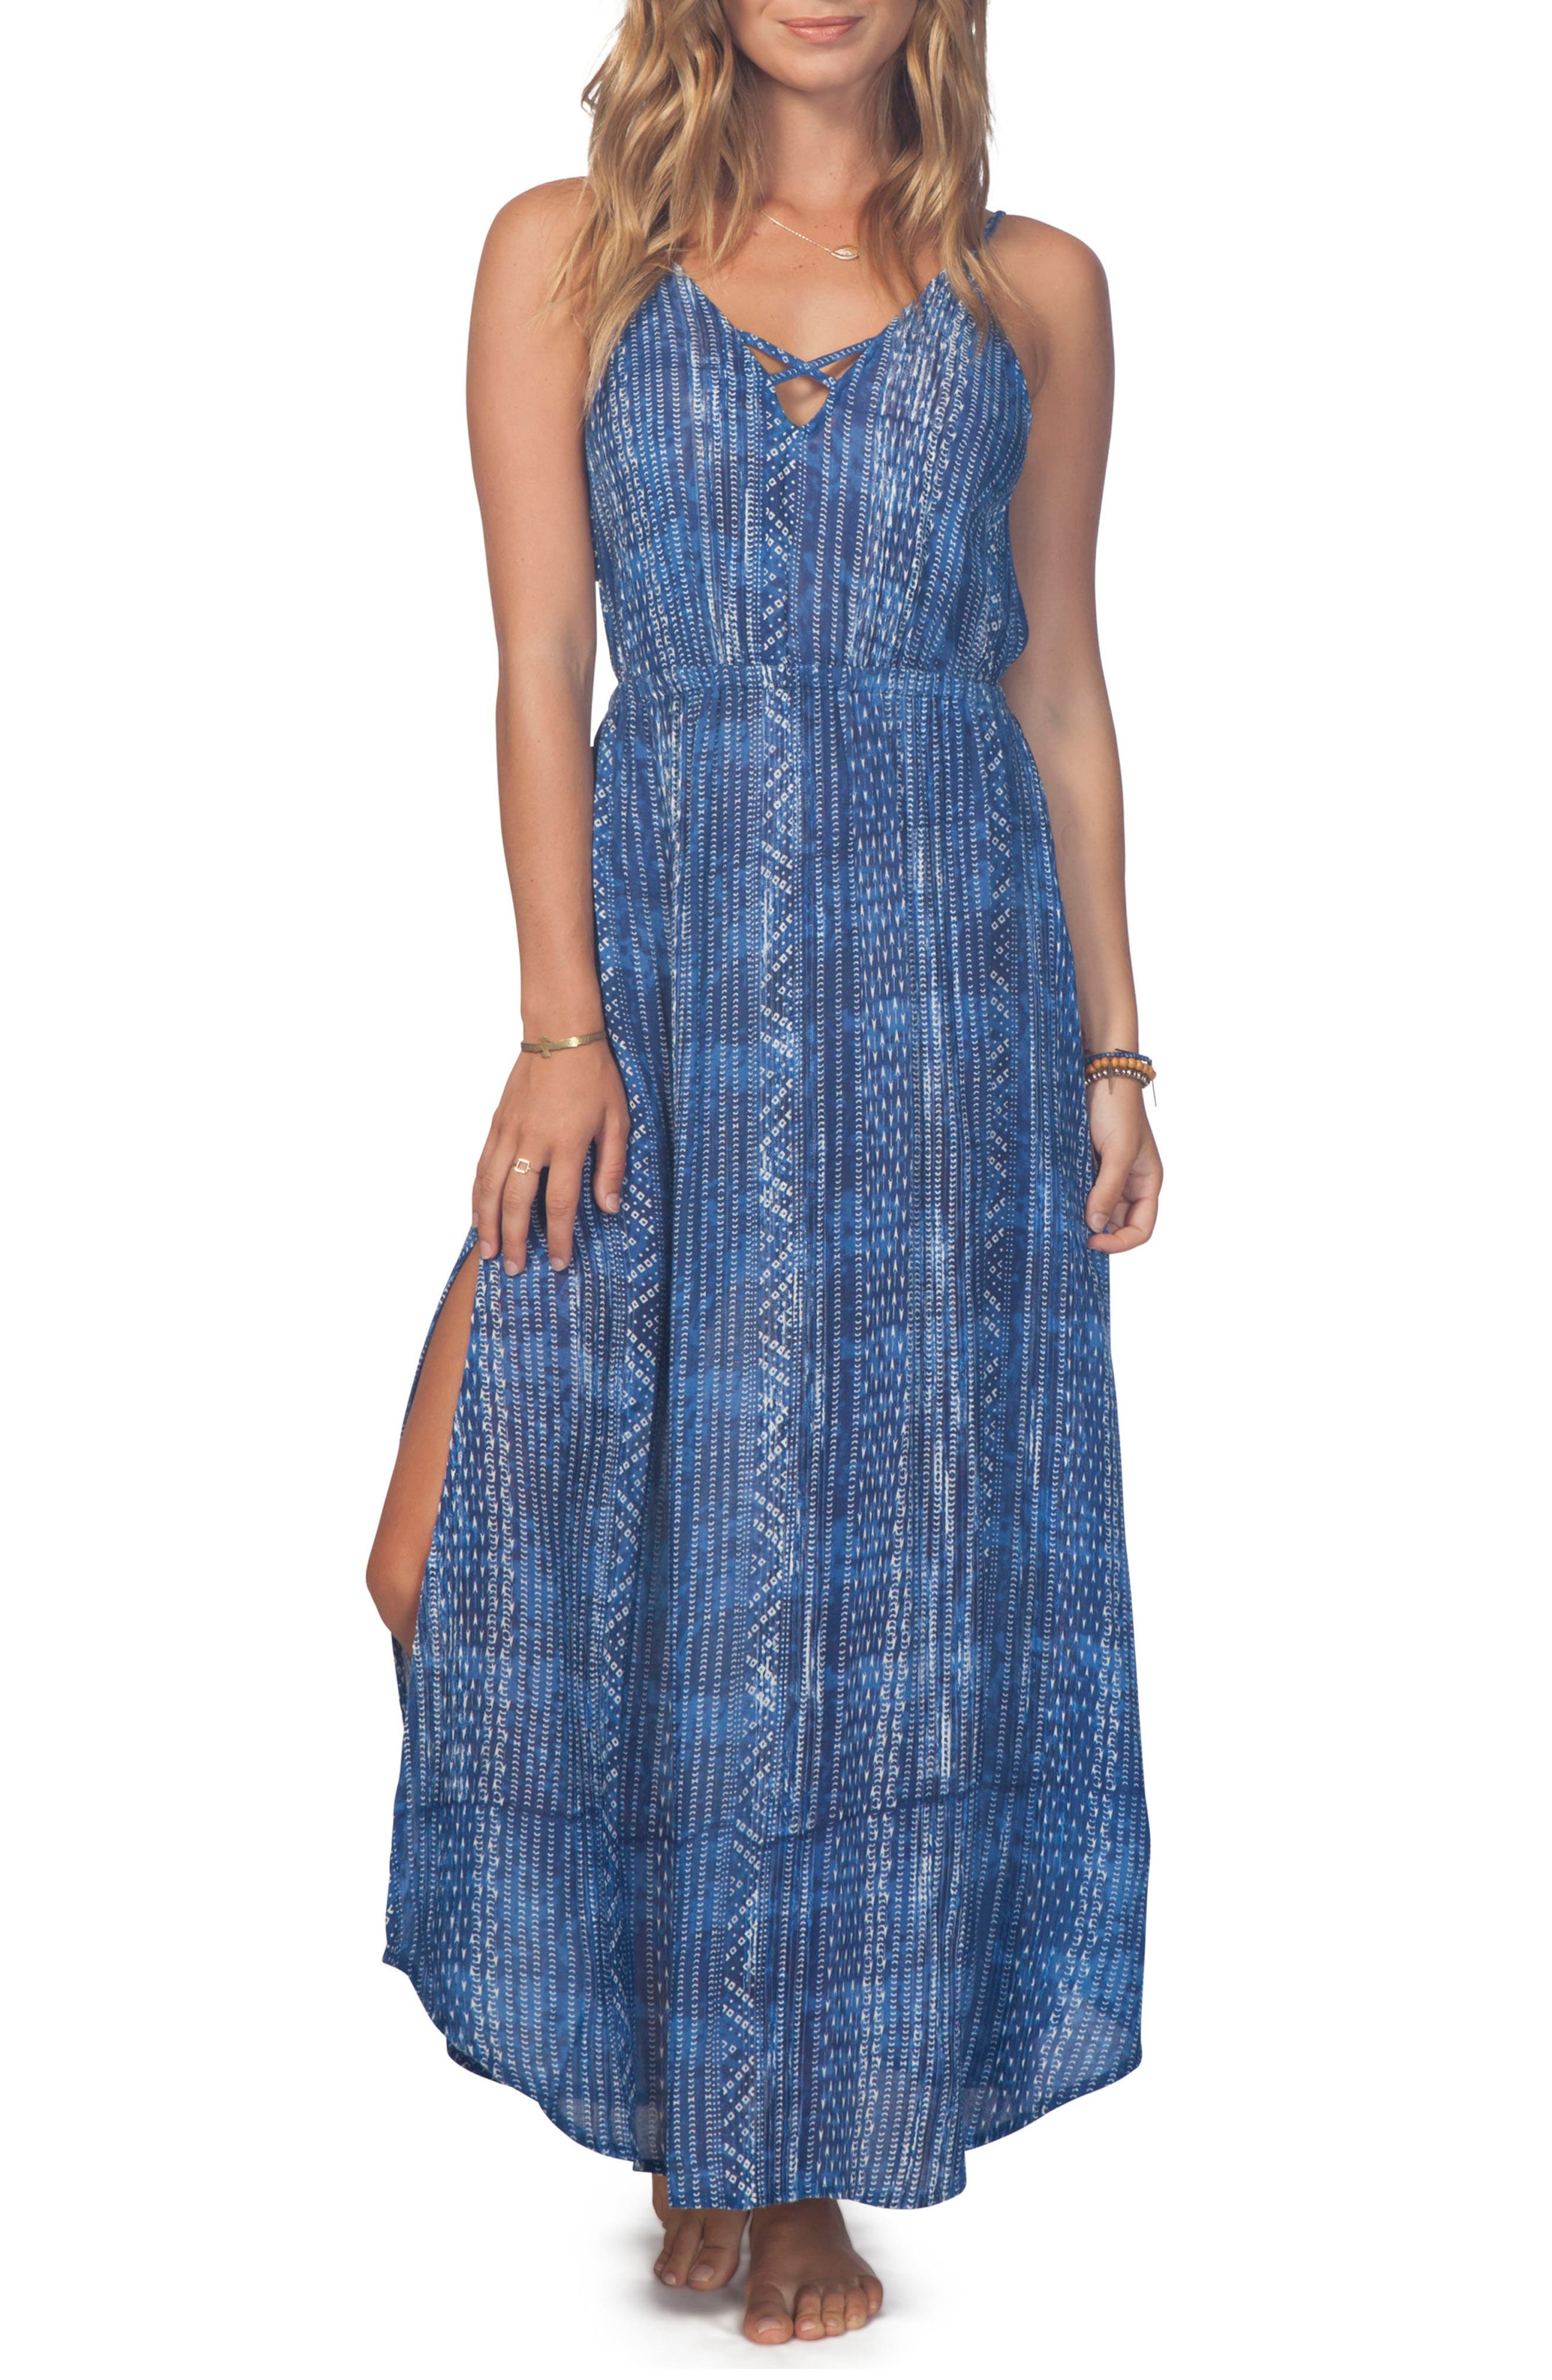 Blue Tides Maxi Dress,                             Main thumbnail 1, color,                             400